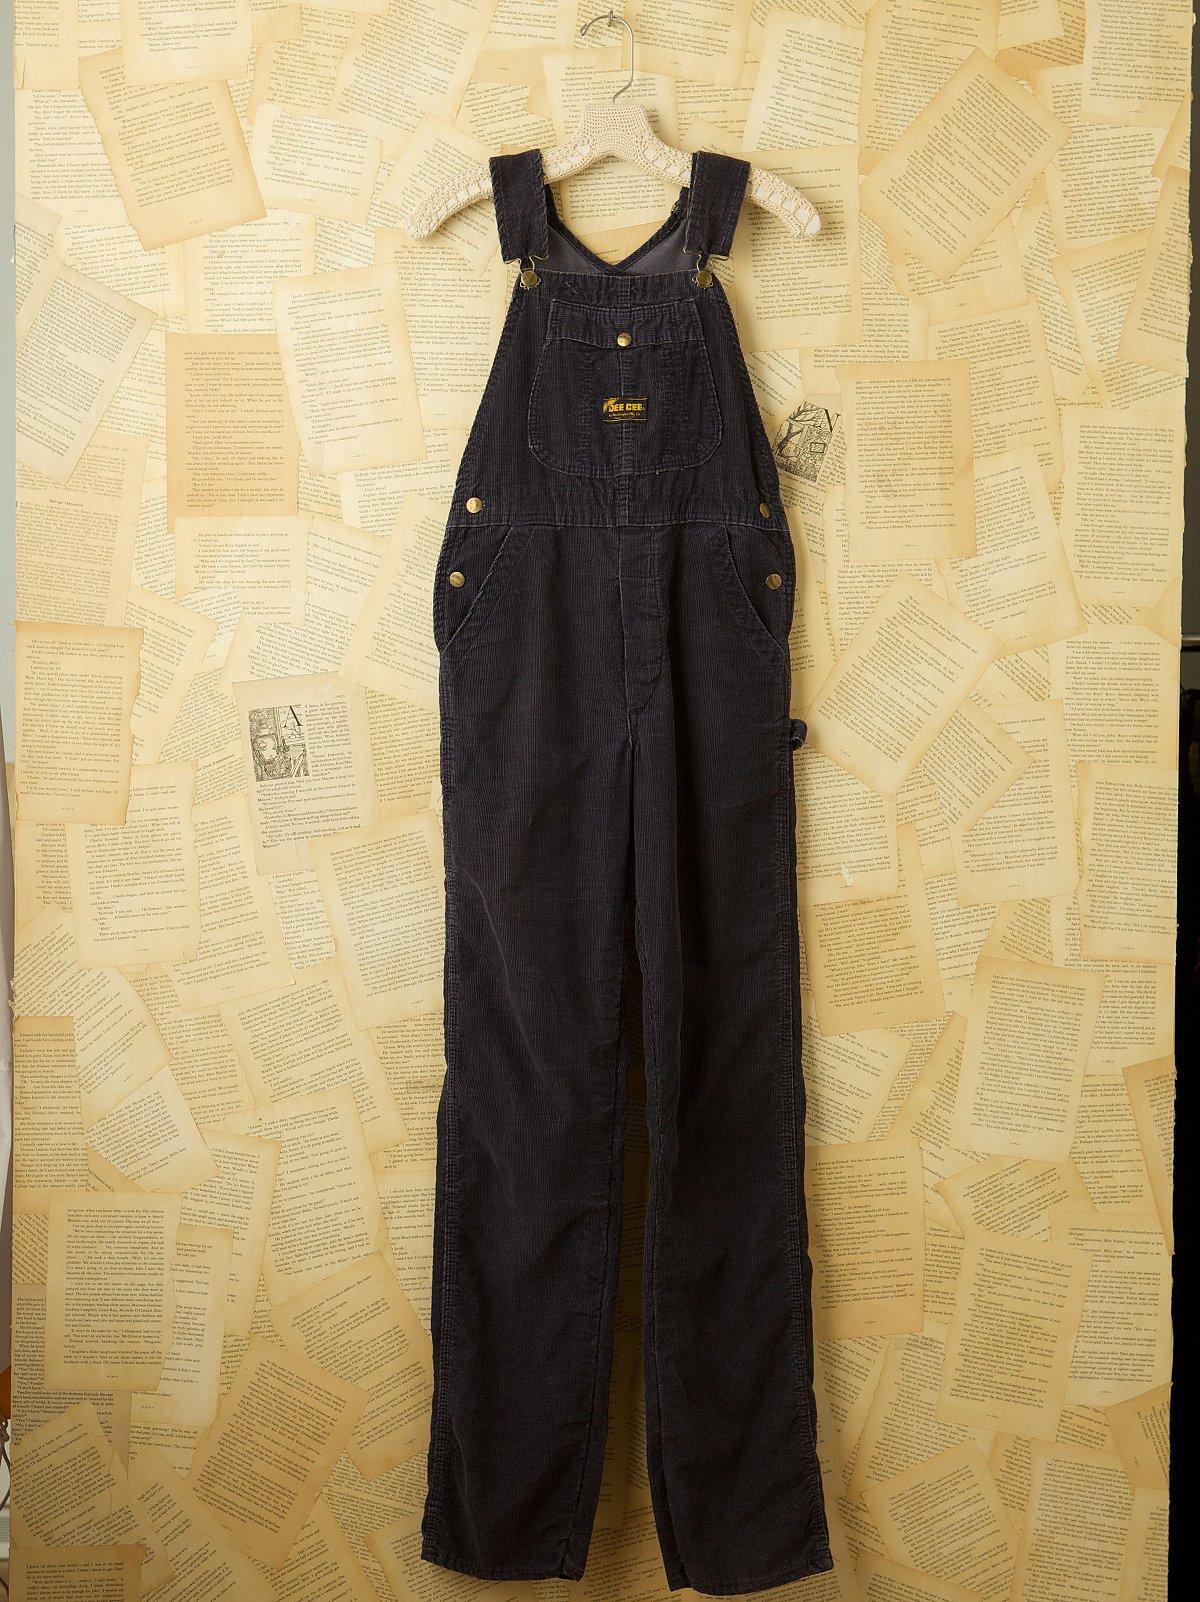 Vintage Navy Corduroy Overalls